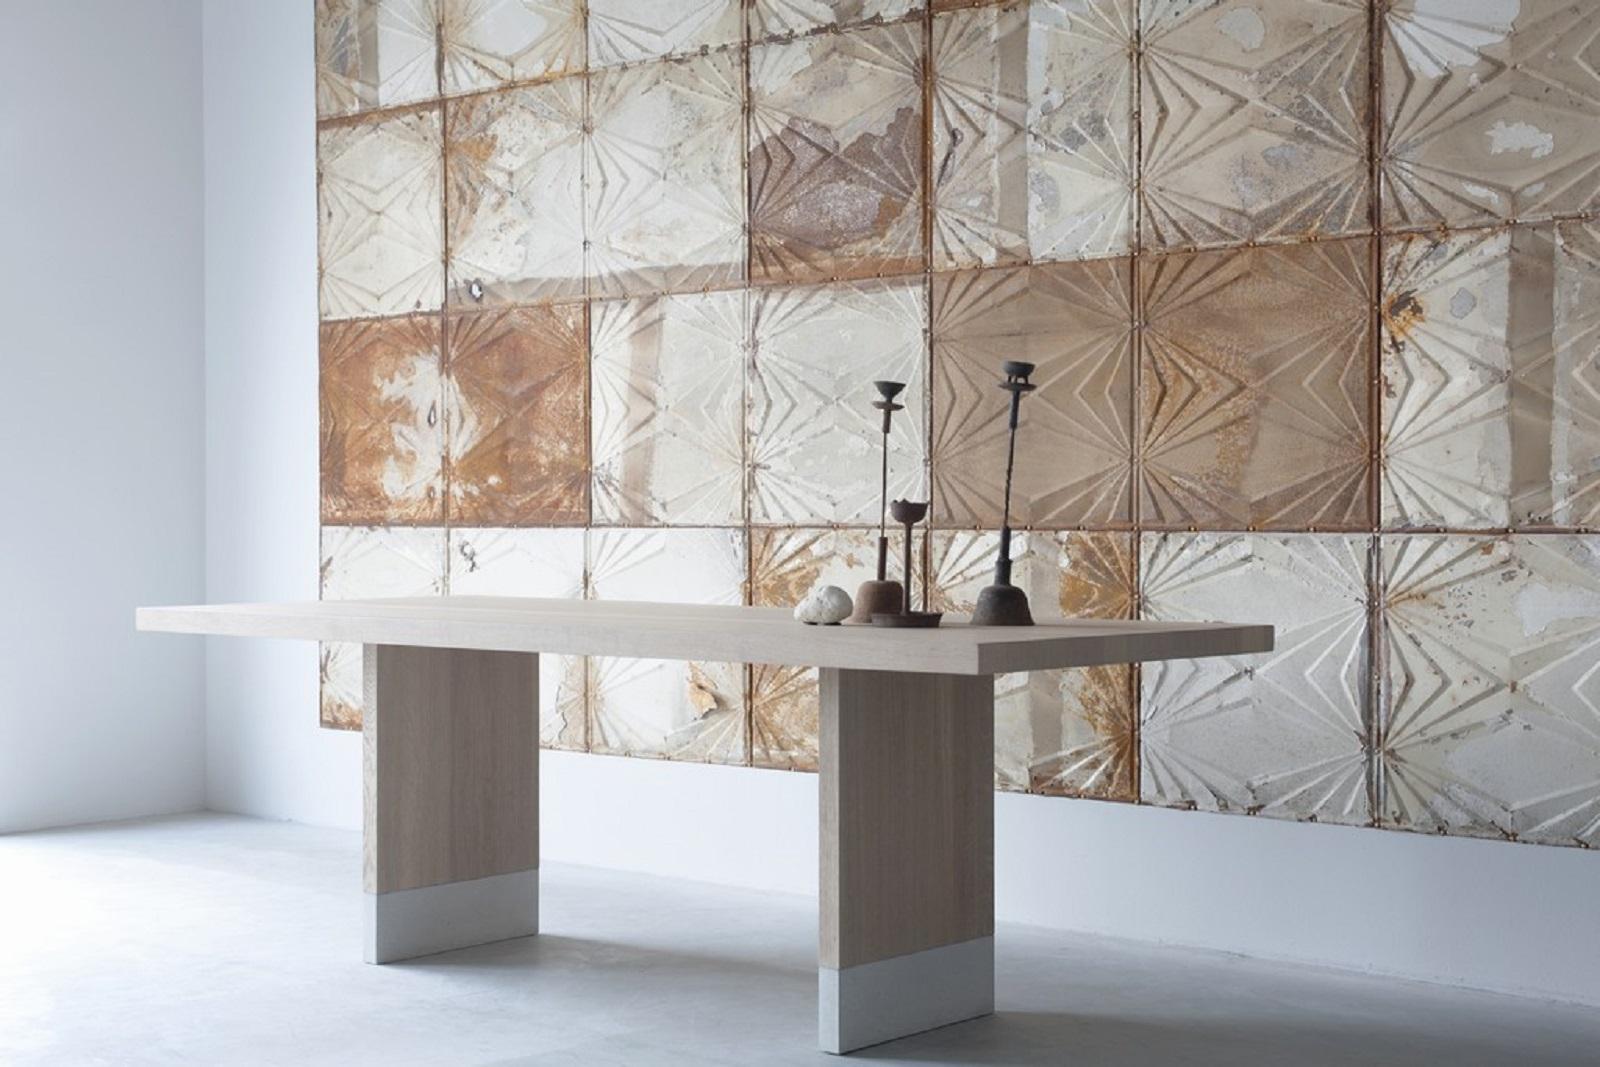 Common dining table (4) grooit.jpg